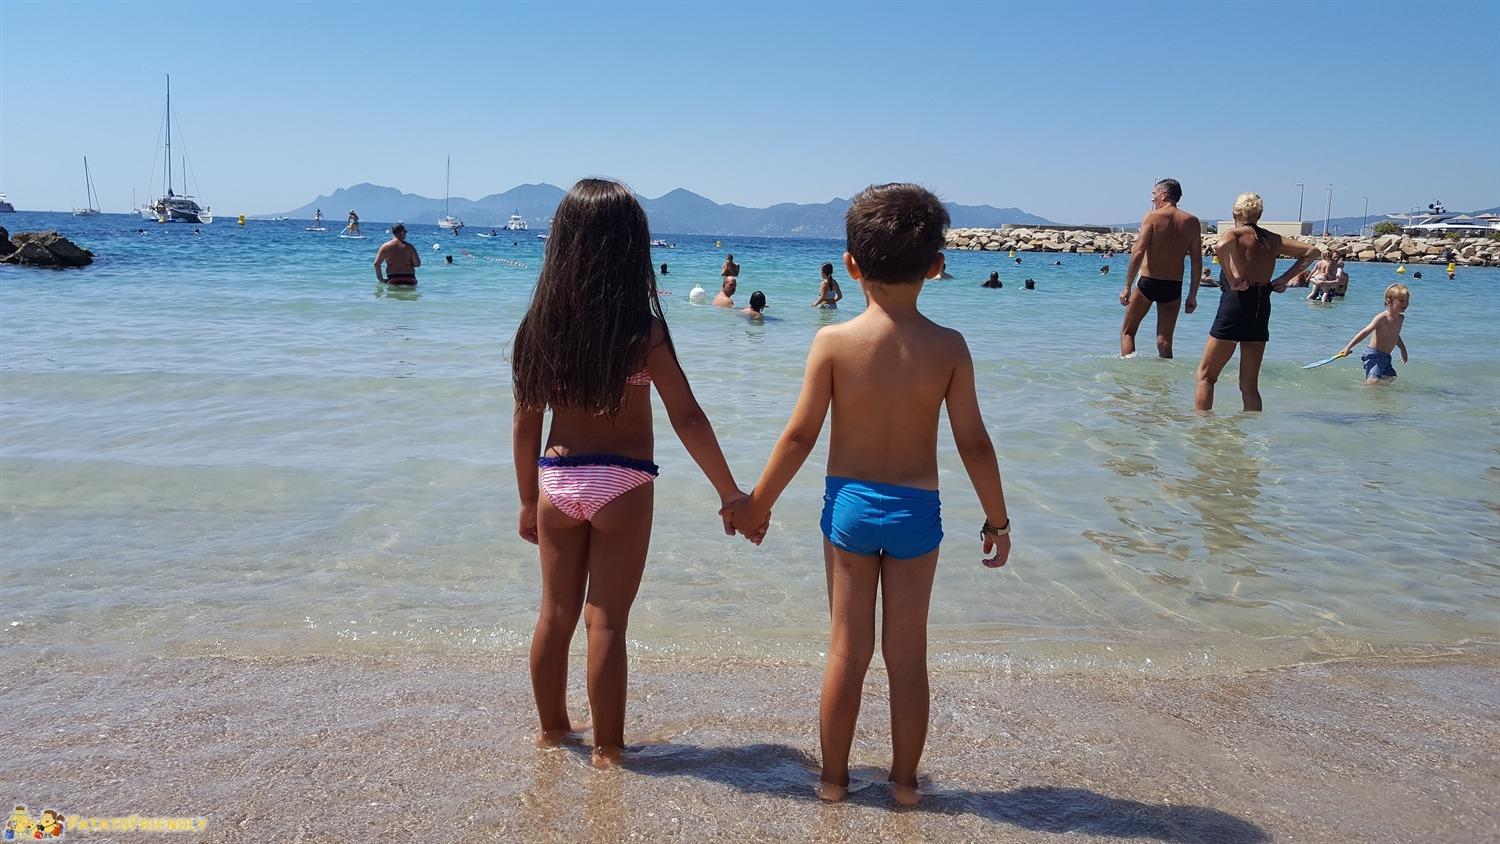 [cml_media_alt id='8674']Costa Azzurra - Il mare trasparente di Cannes[/cml_media_alt]